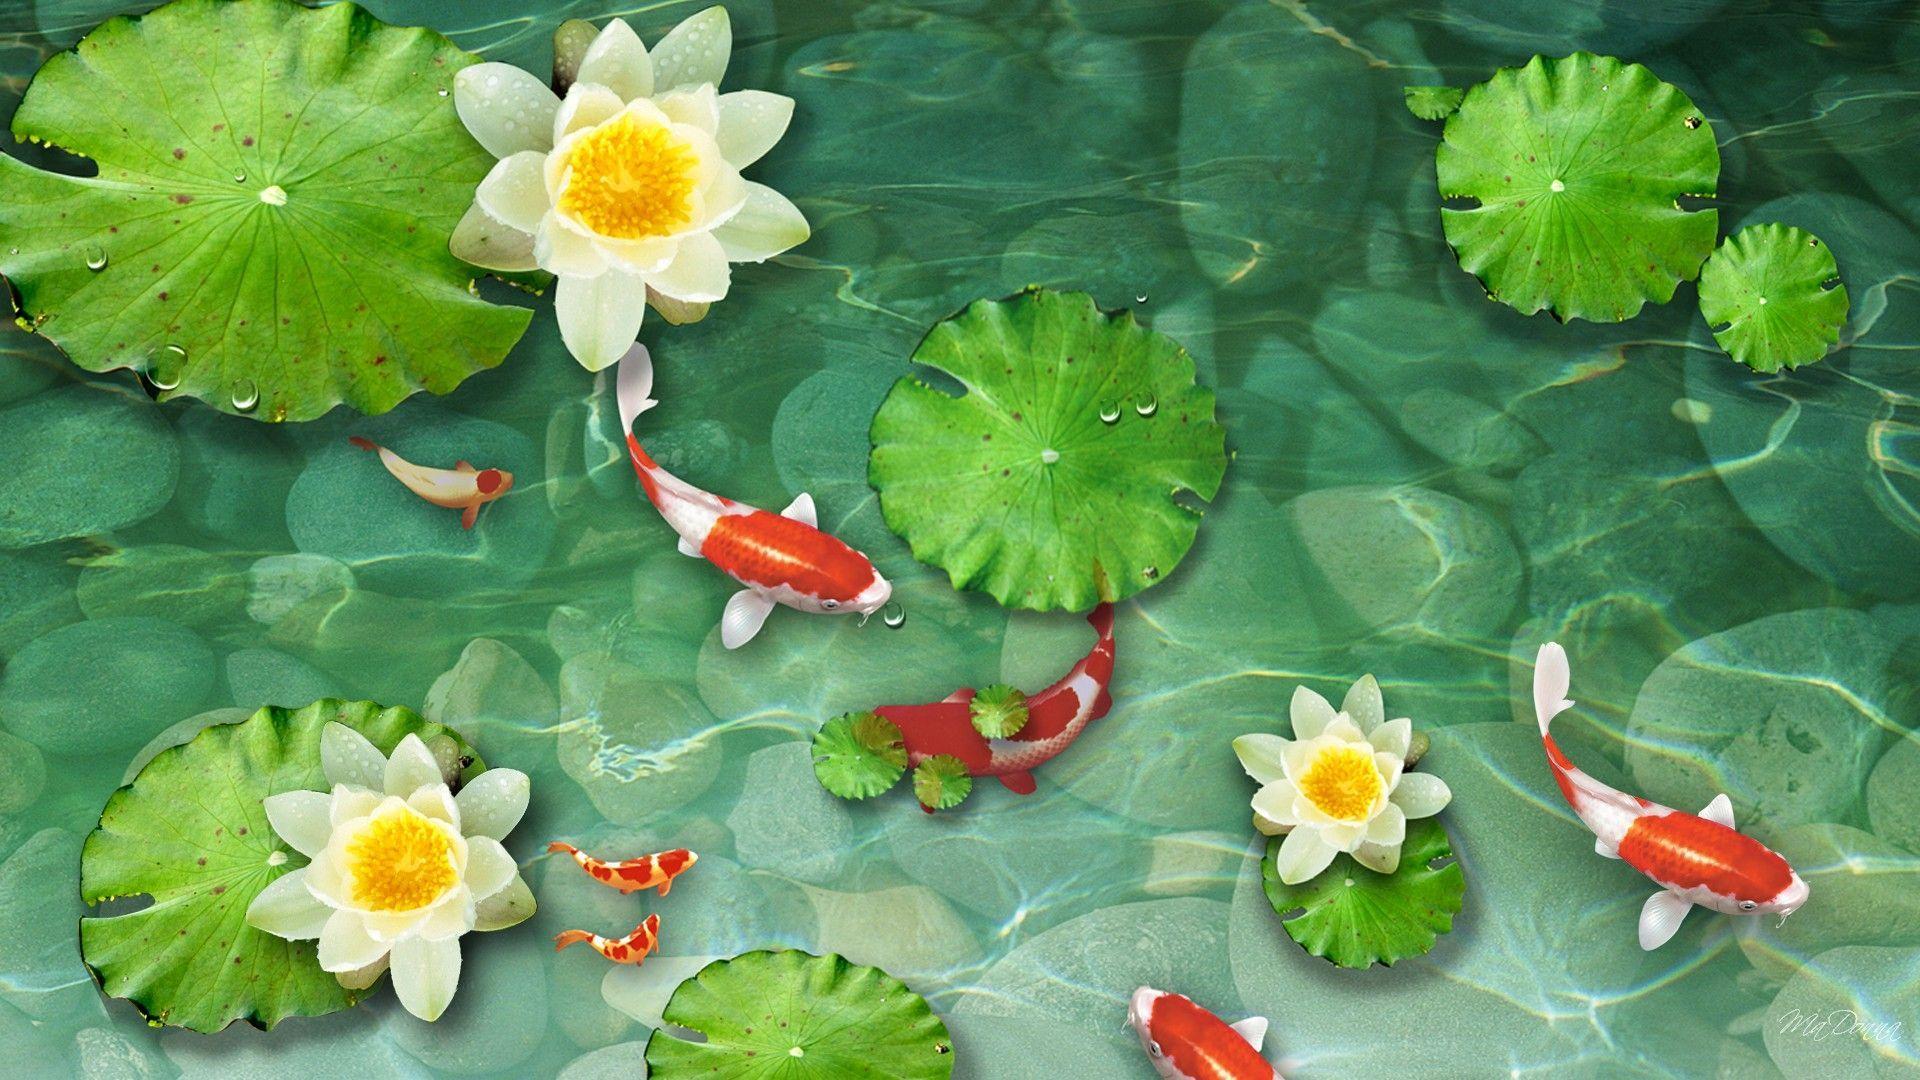 Koi Pond Wallpapers Wallpaper Cave Koi Pond Koi Fish Drawings